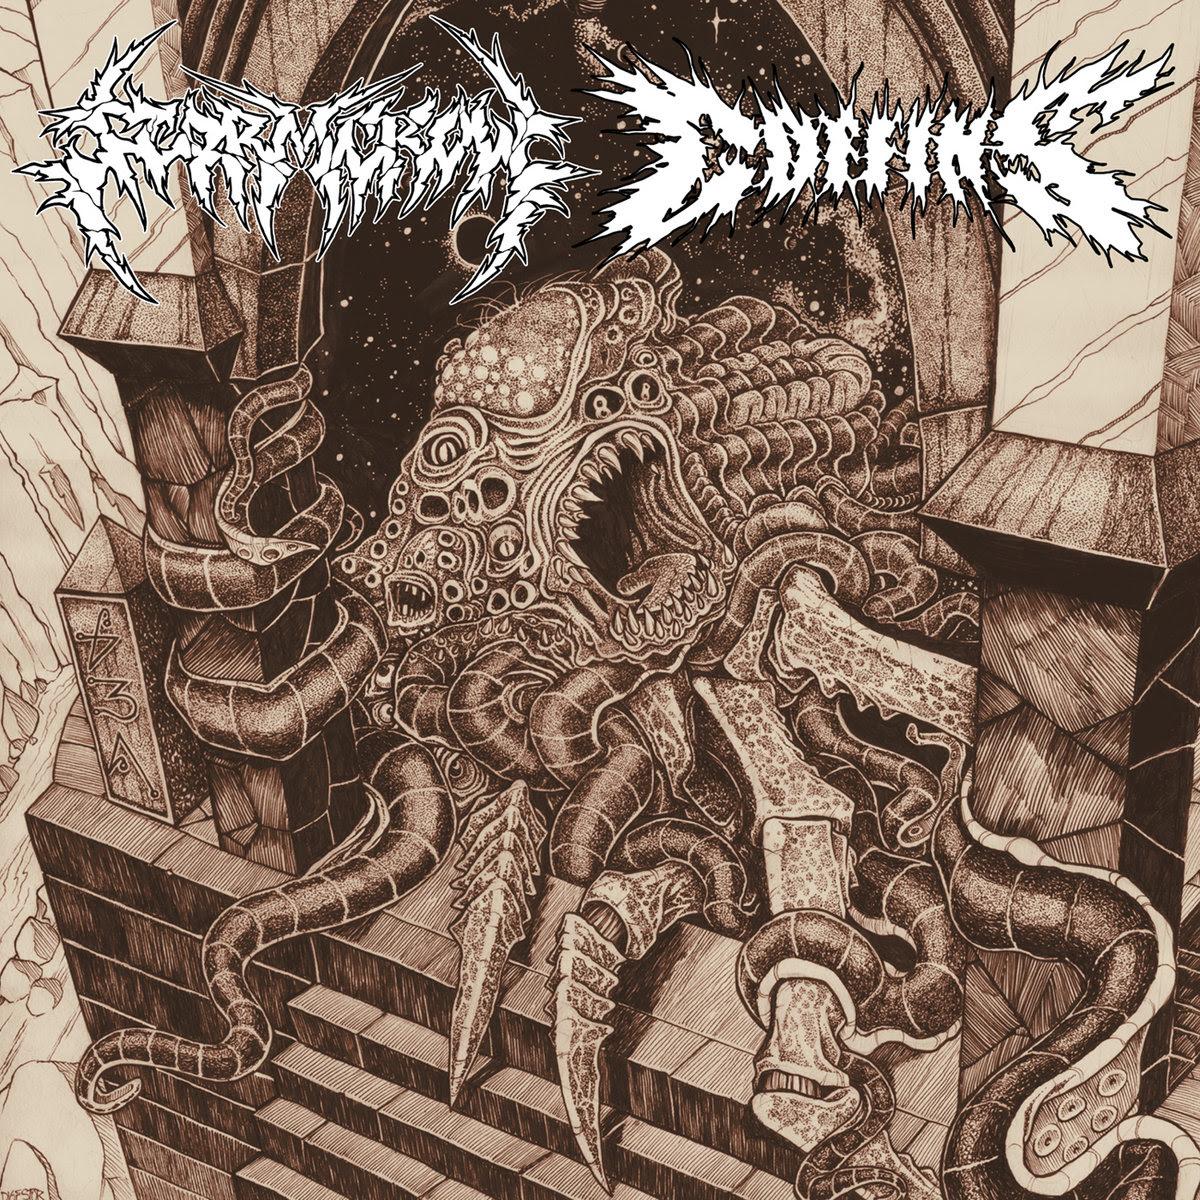 Stormcrow / Coffins - Split (2010)